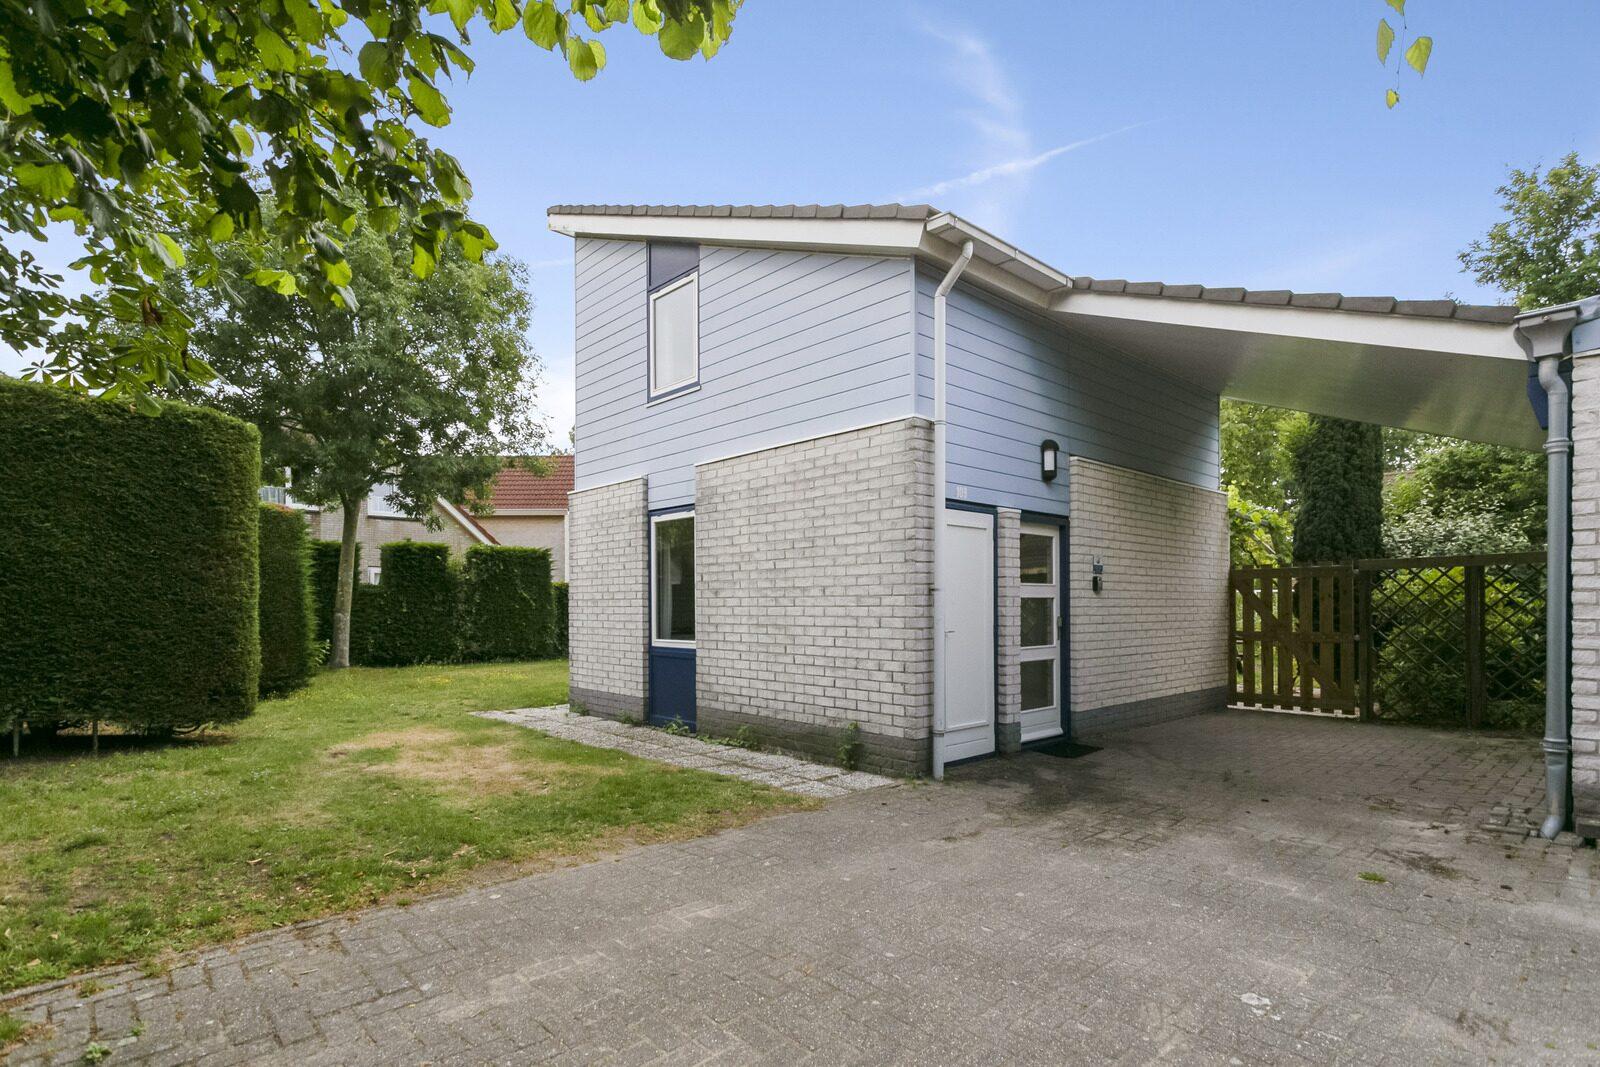 Mosselbank 109 - Noordzeepark Ouddorp